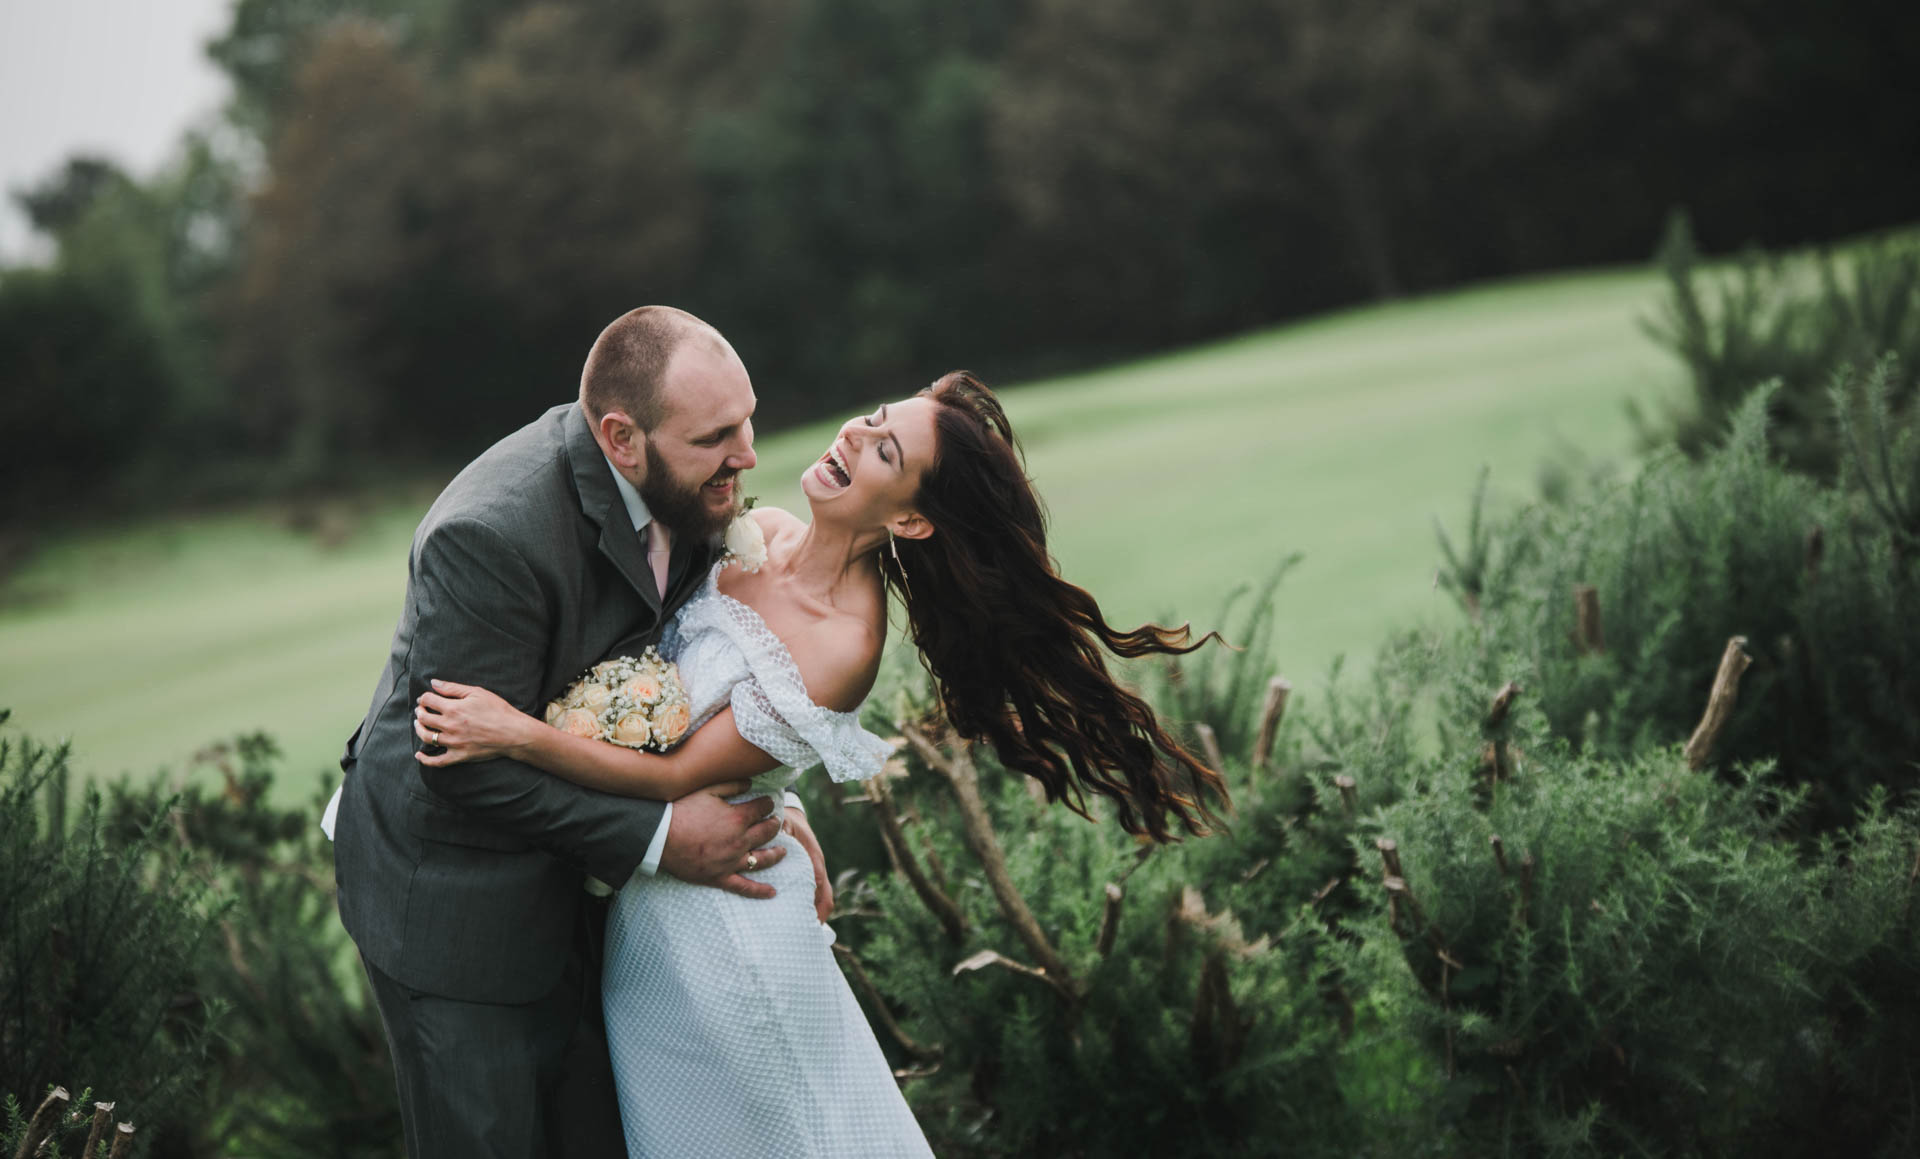 Jacinta & John Wedding Day – Killarney – 23.09.2016 (reportage of the wedding as second photographer)